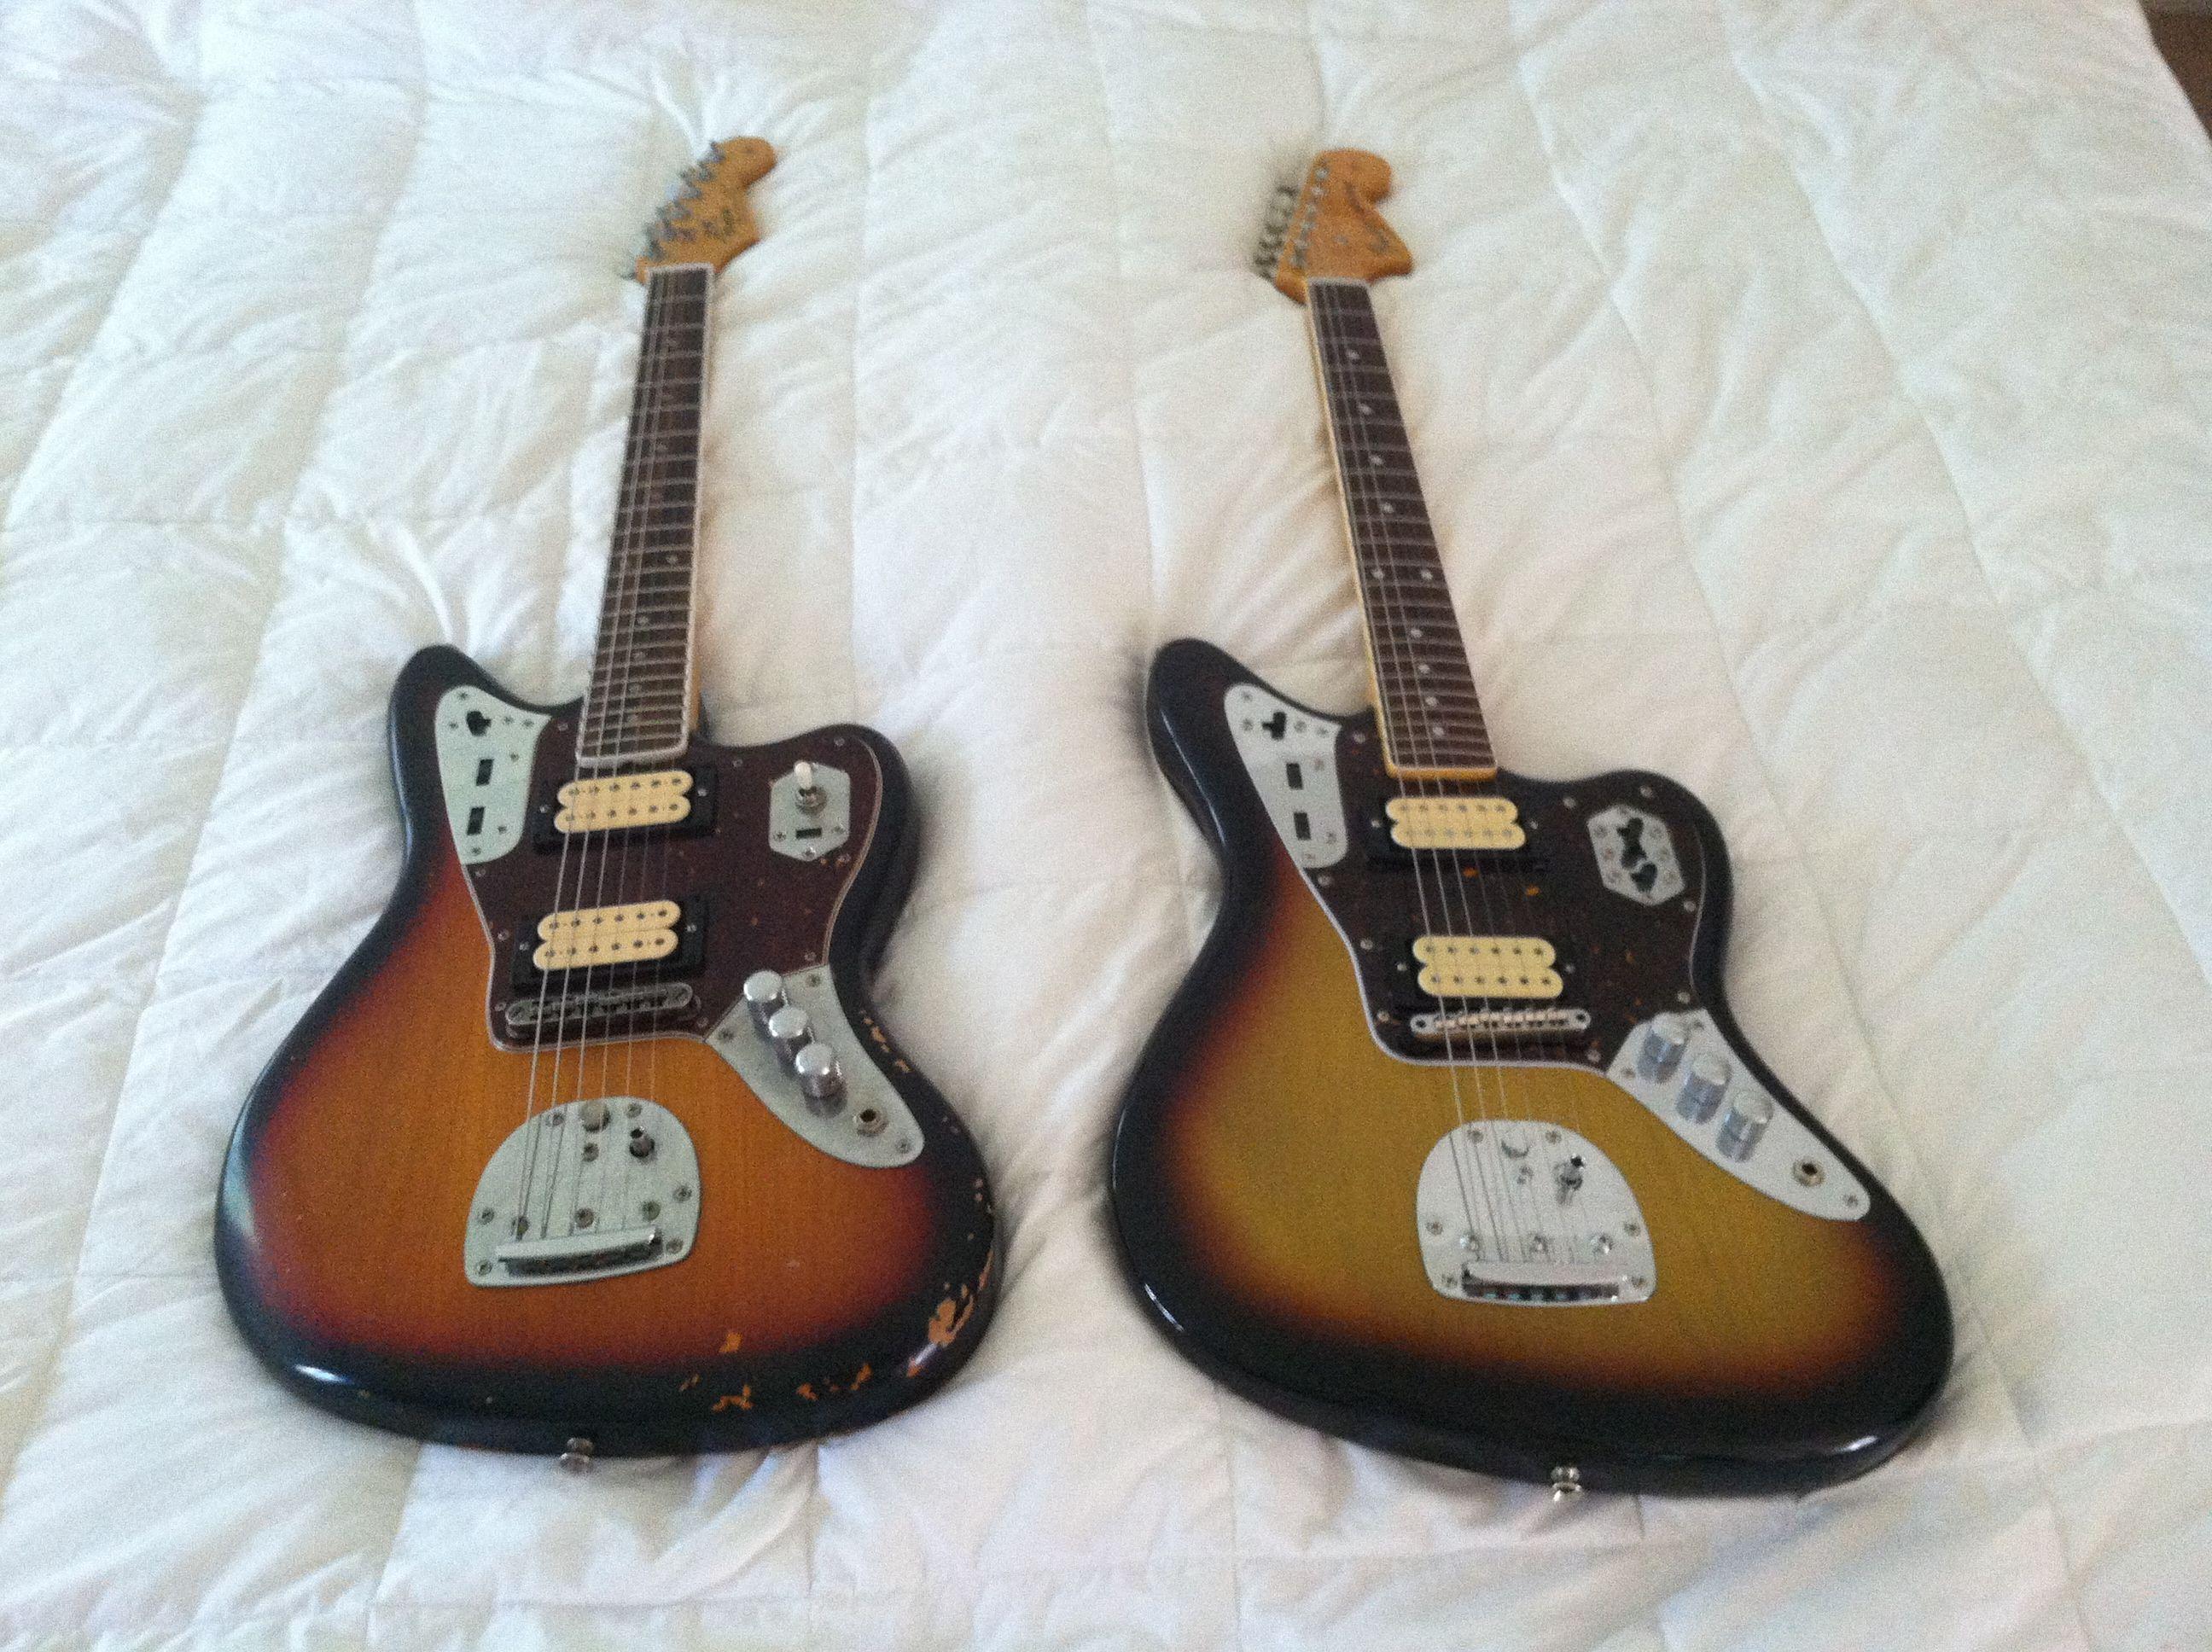 Mexico Vs Japan On The Signature Kurt Cobain Fender Jaguar Fender Jaguar Fender Mustang Guitar Donald Cobain